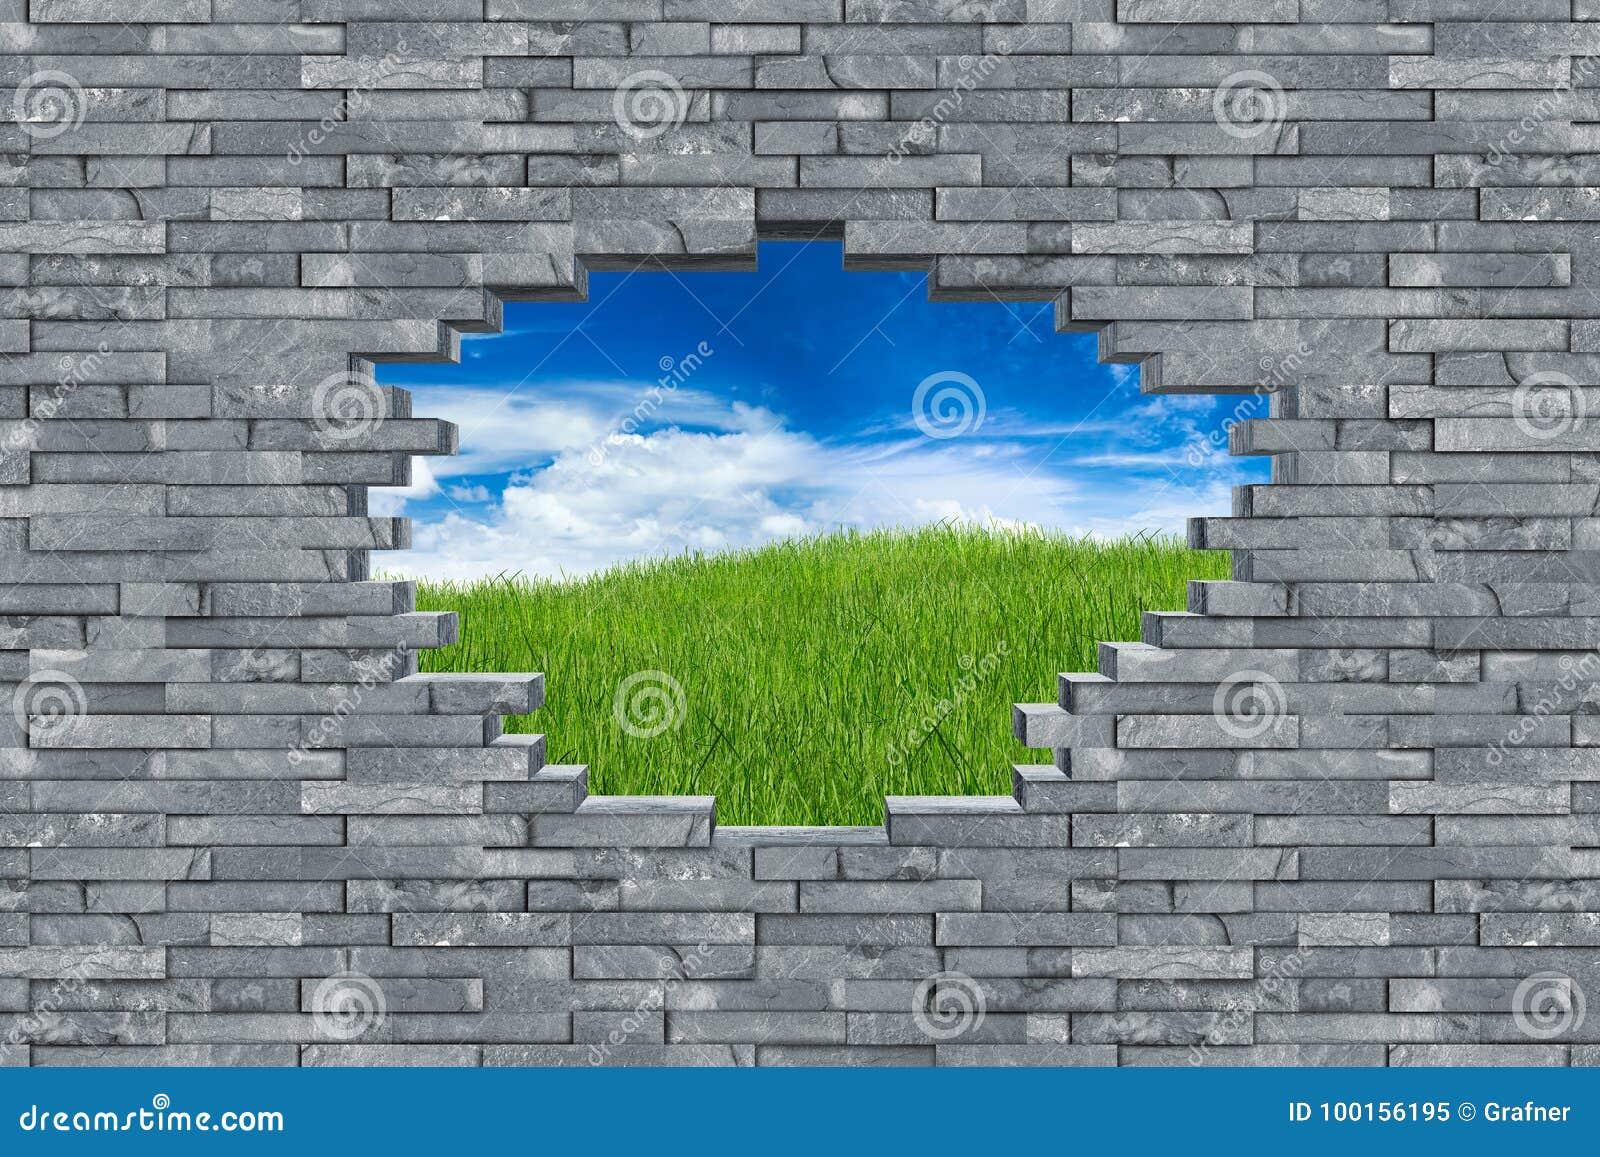 Slate stone wall hole breakout concept